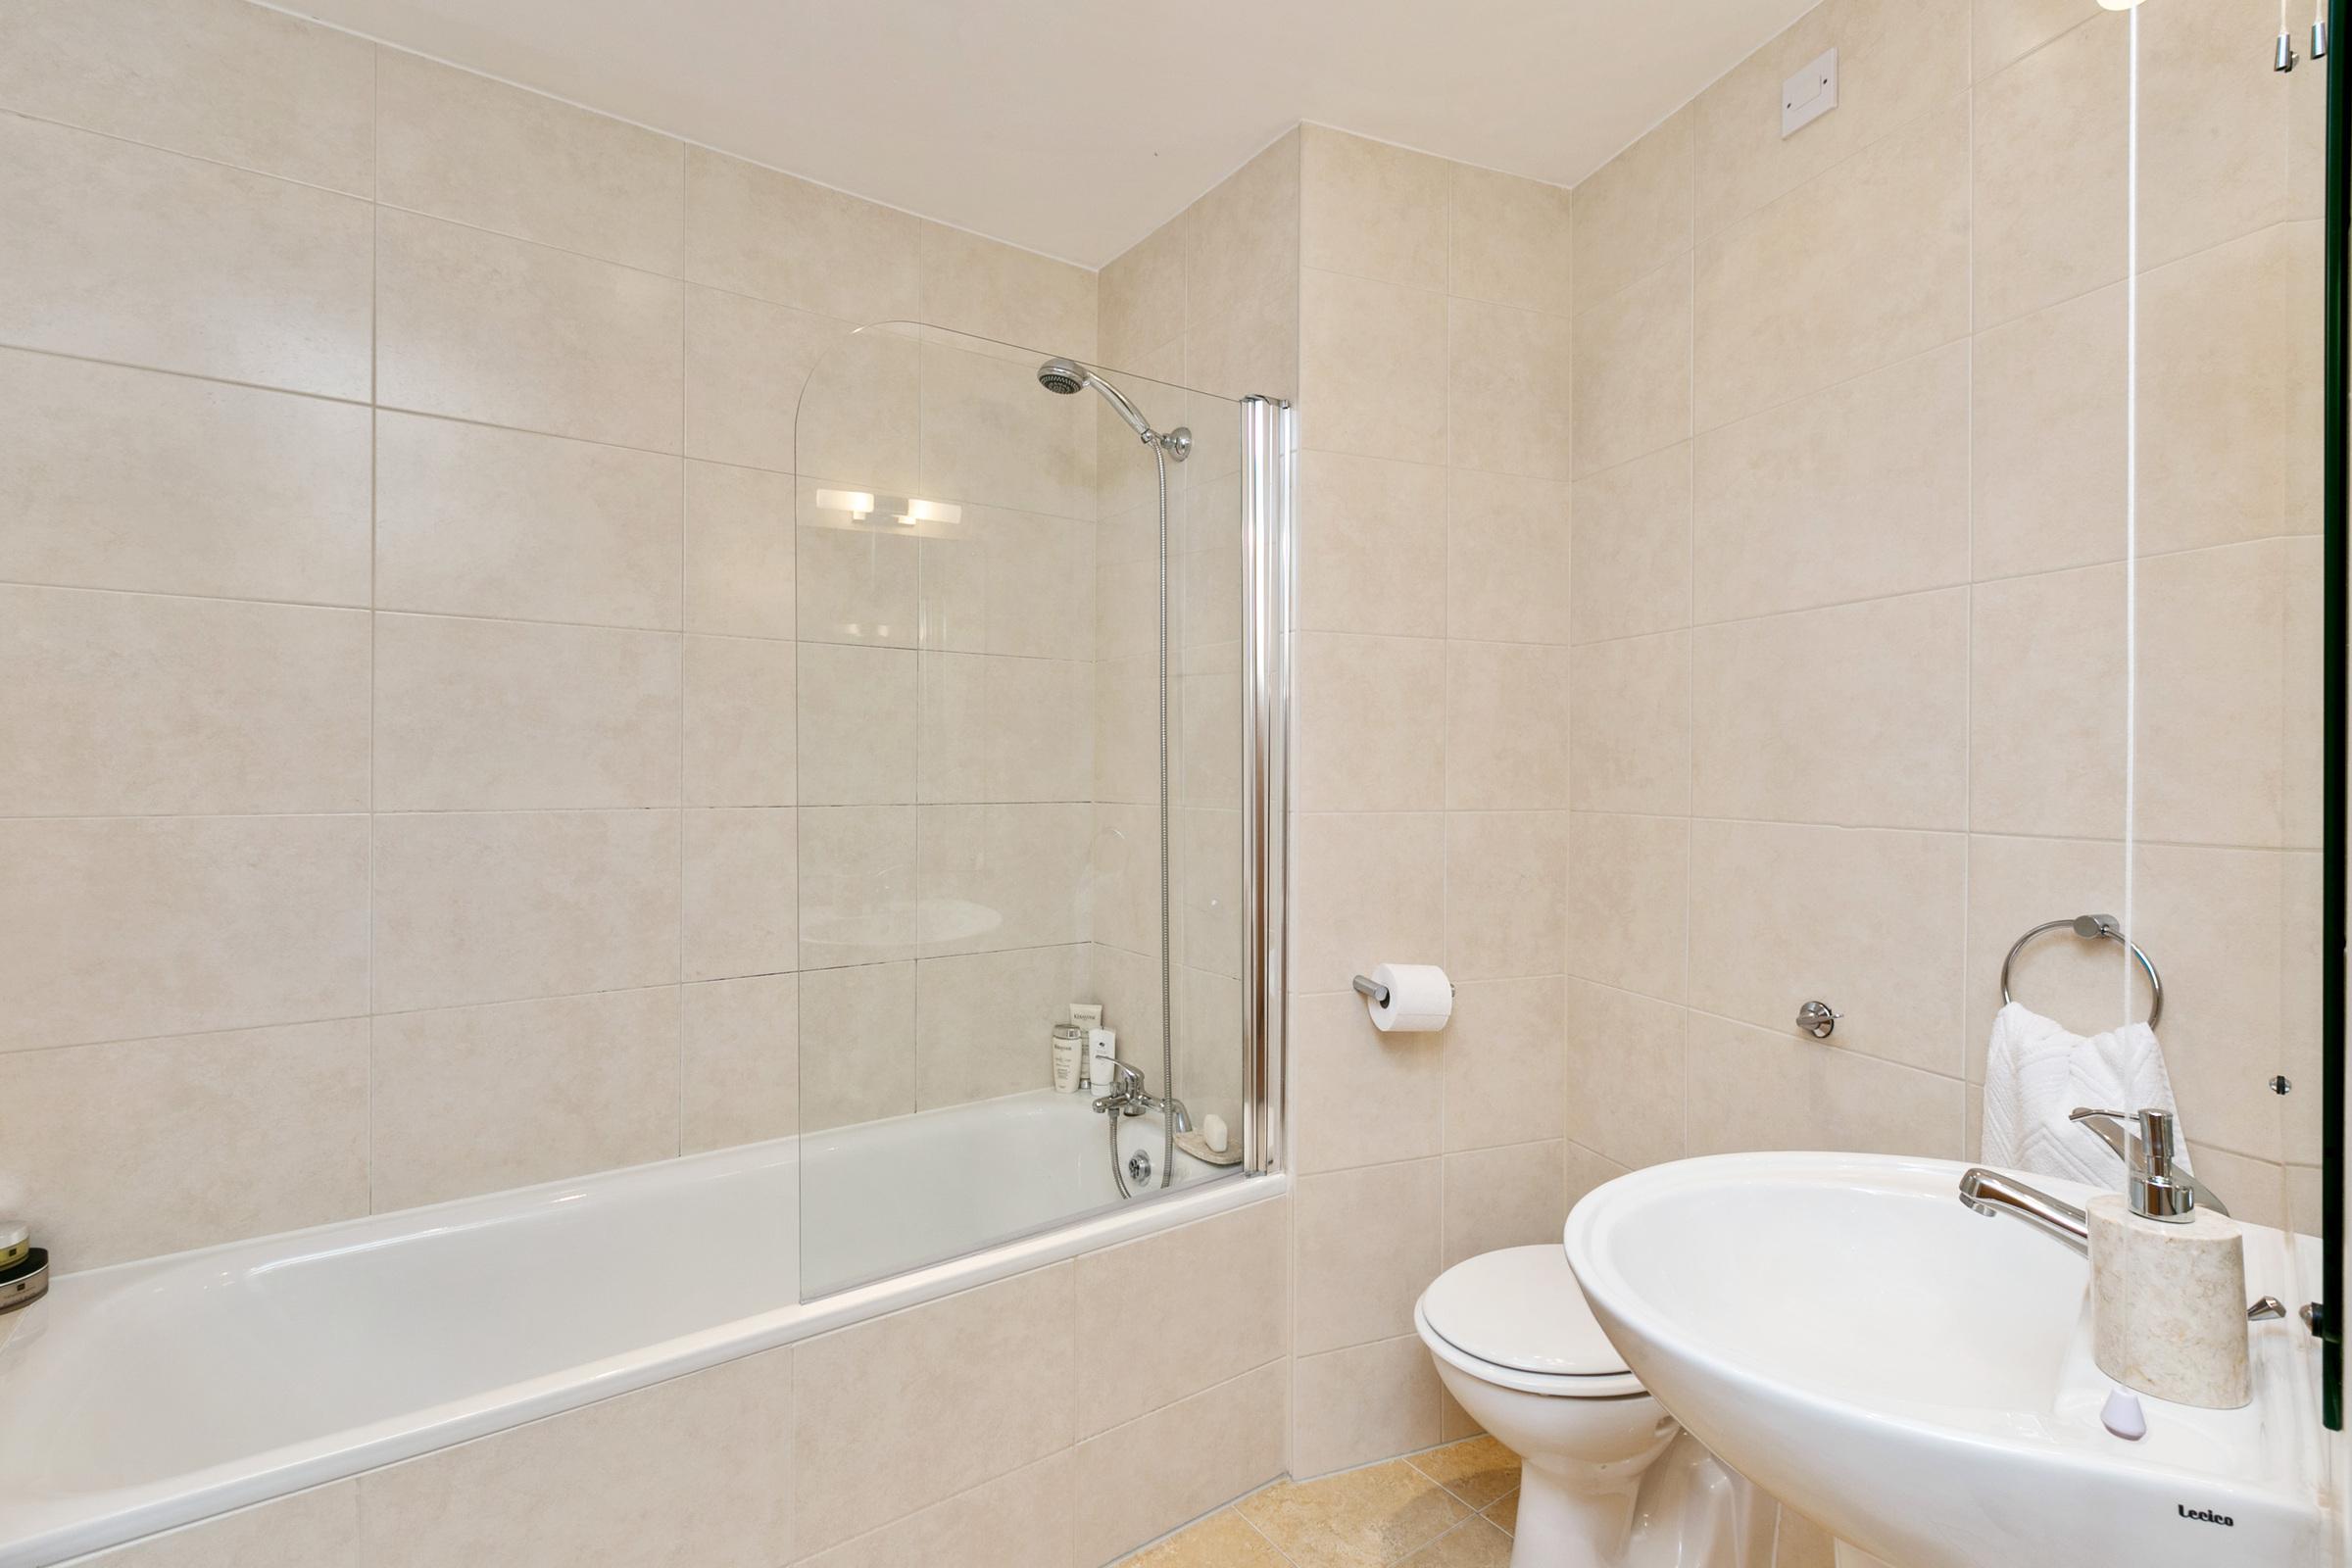 Apartment 56, The Oaks, Dundrum, Dublin 14